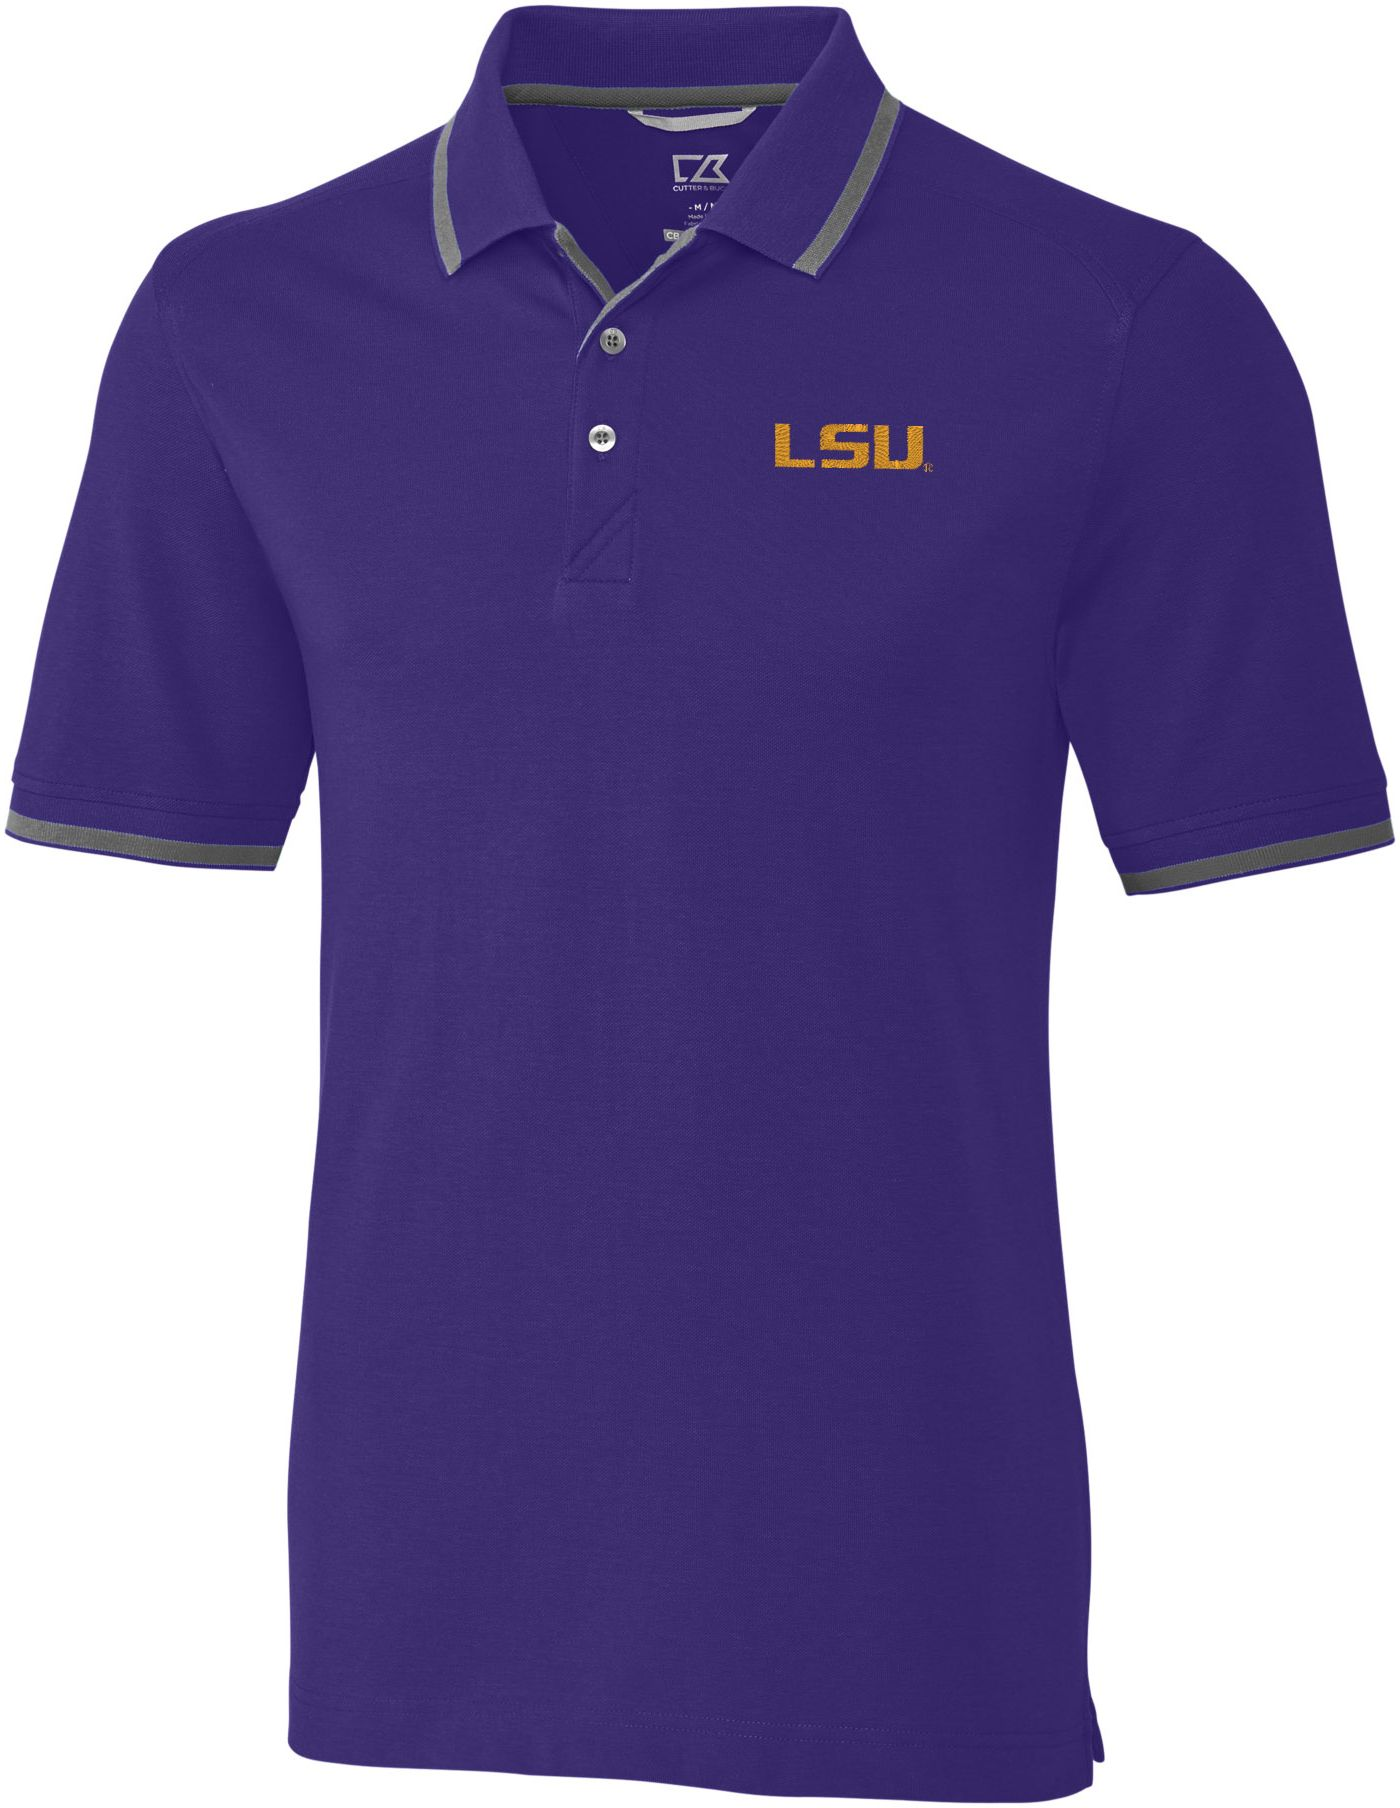 Cutter & Buck Men's LSU Tigers Purple Advantage Tipped Polo